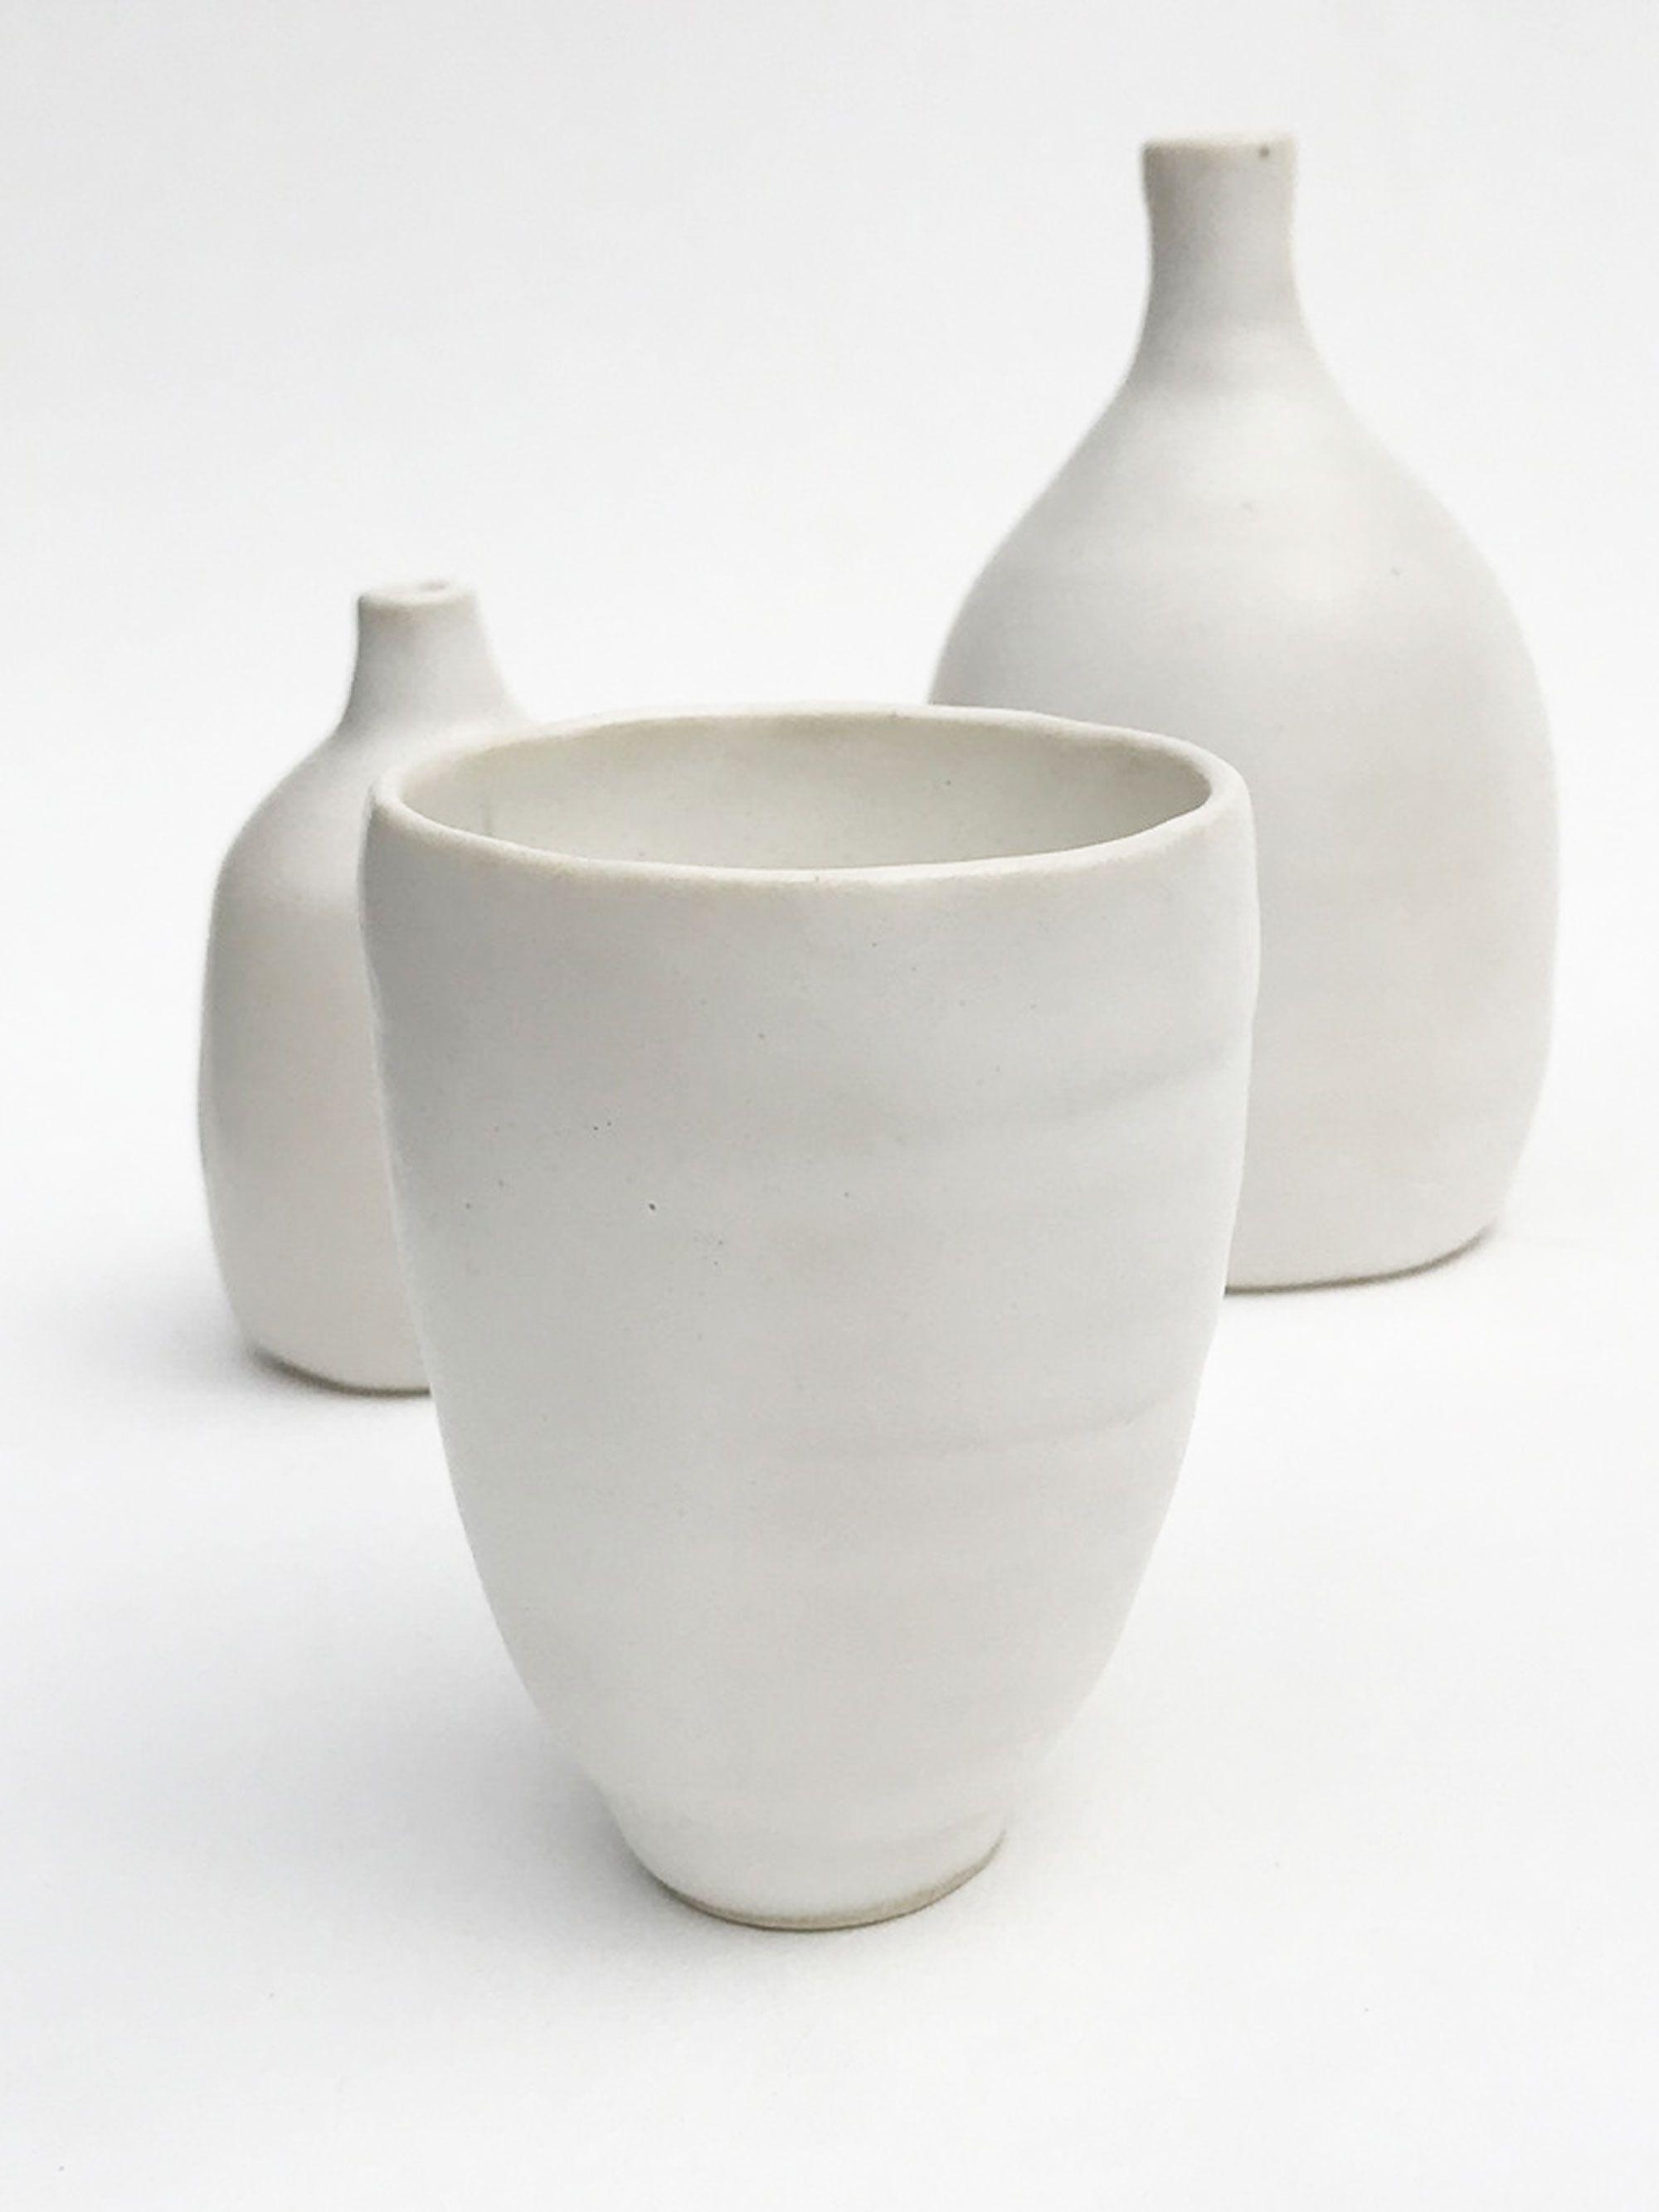 Wishing everyone a day of peace.       www.amhceramics.etsy.com   #sake #sakecups #budvases #budvase #claytalk #homedecor #pursuepretty #potterslife #studiopotter #etsymudteam #potterylove #handmadepottery #ceramiclove #etsyfinds #instapottery #pottersofinstagram #claystagram